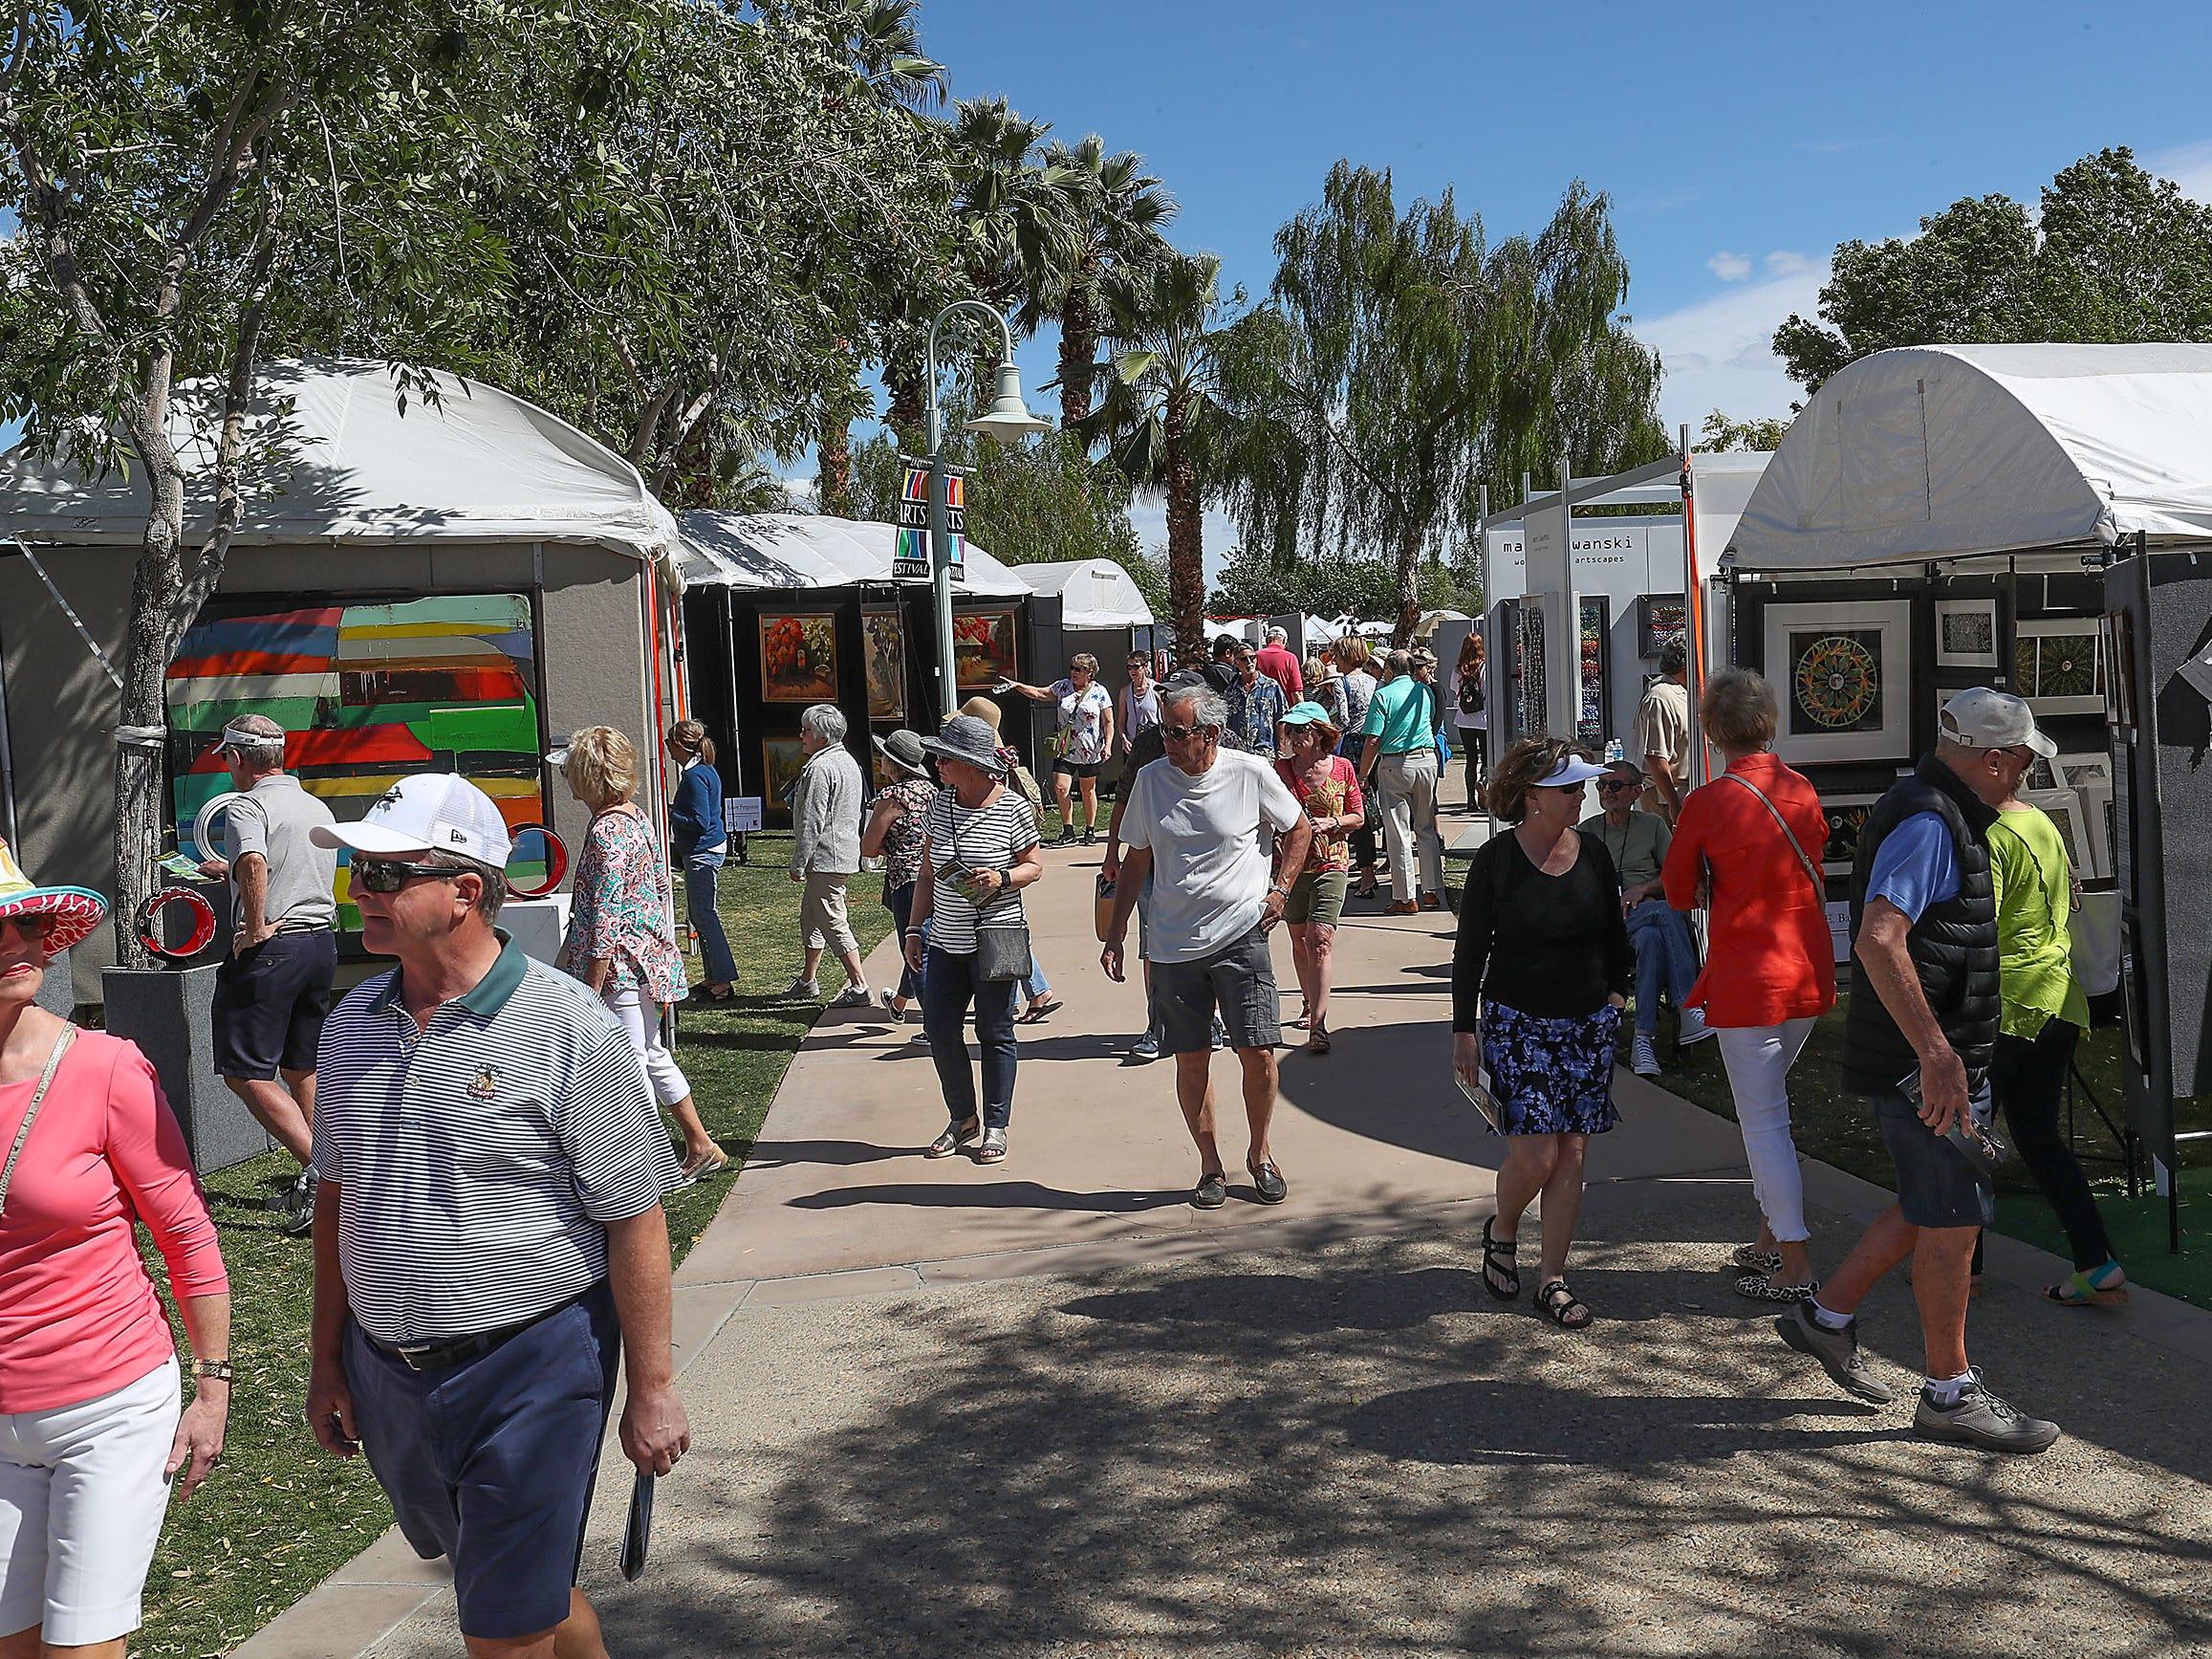 Visitors to the La Quinta Arts Festival check out the artwork, March 7, 2019.